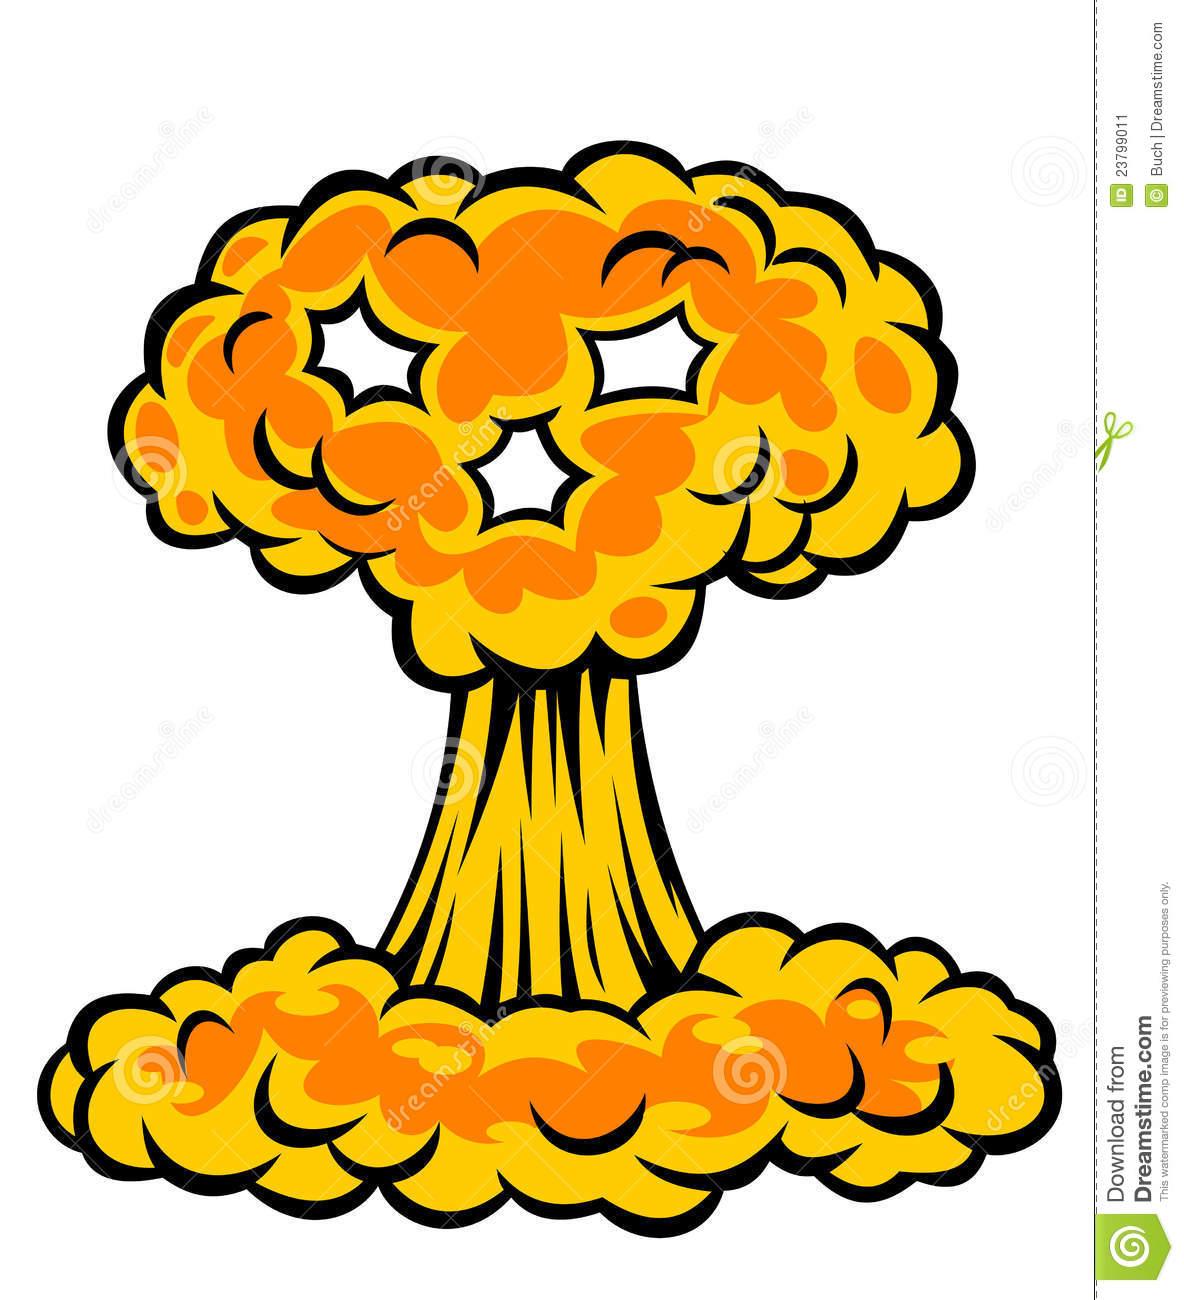 Mushroom Cloud Clipart - Clipart Kid